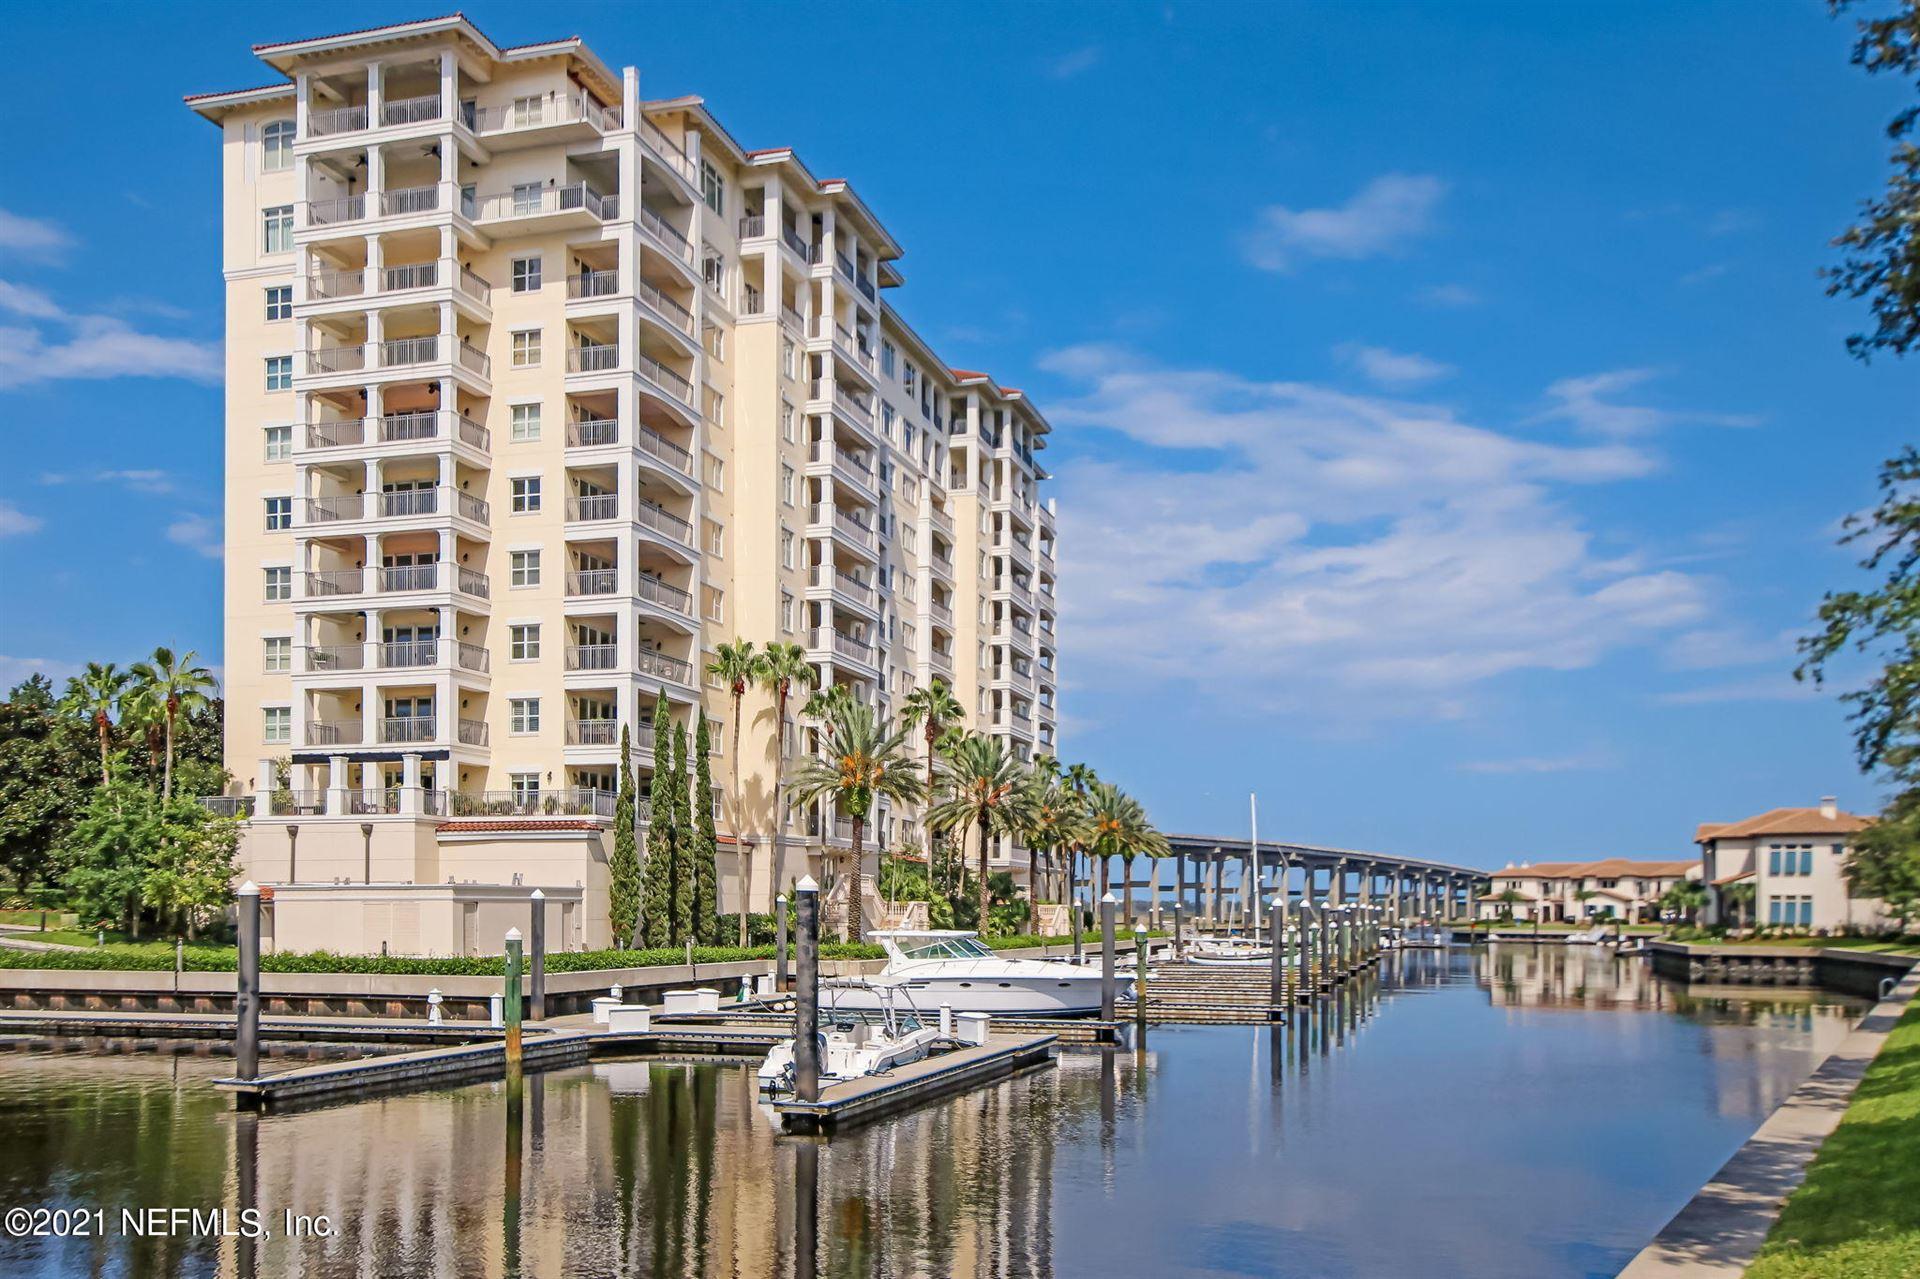 14402 MARINA SAN PABLO PL, Jacksonville, FL 32224 - MLS#: 1107544